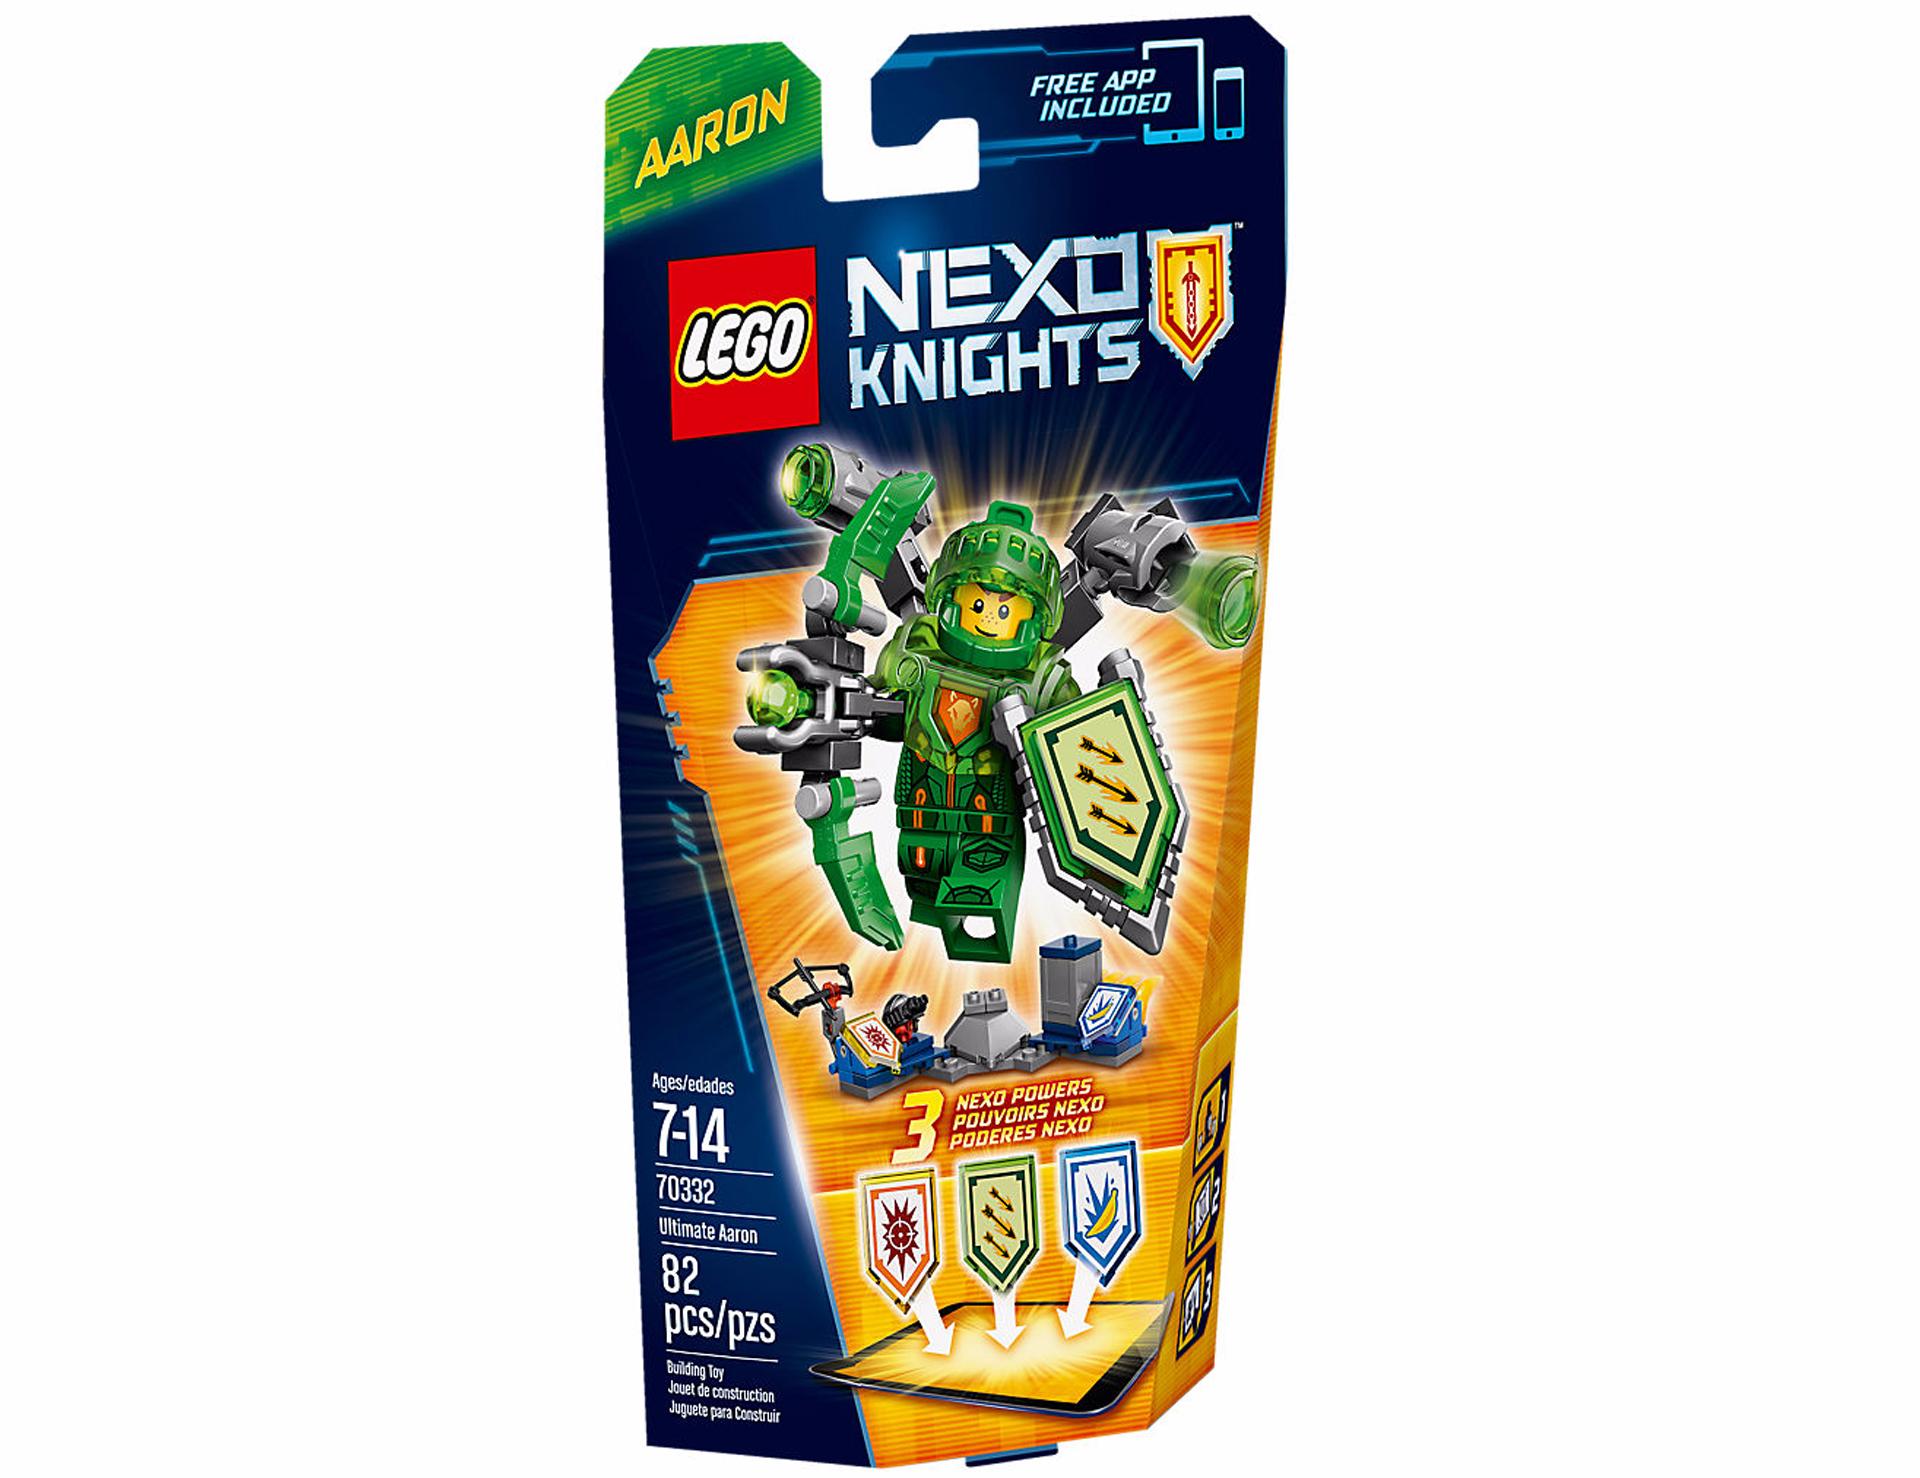 L'ultime Knights Nexo Aaron Lego Chevalier rdoBeCxW